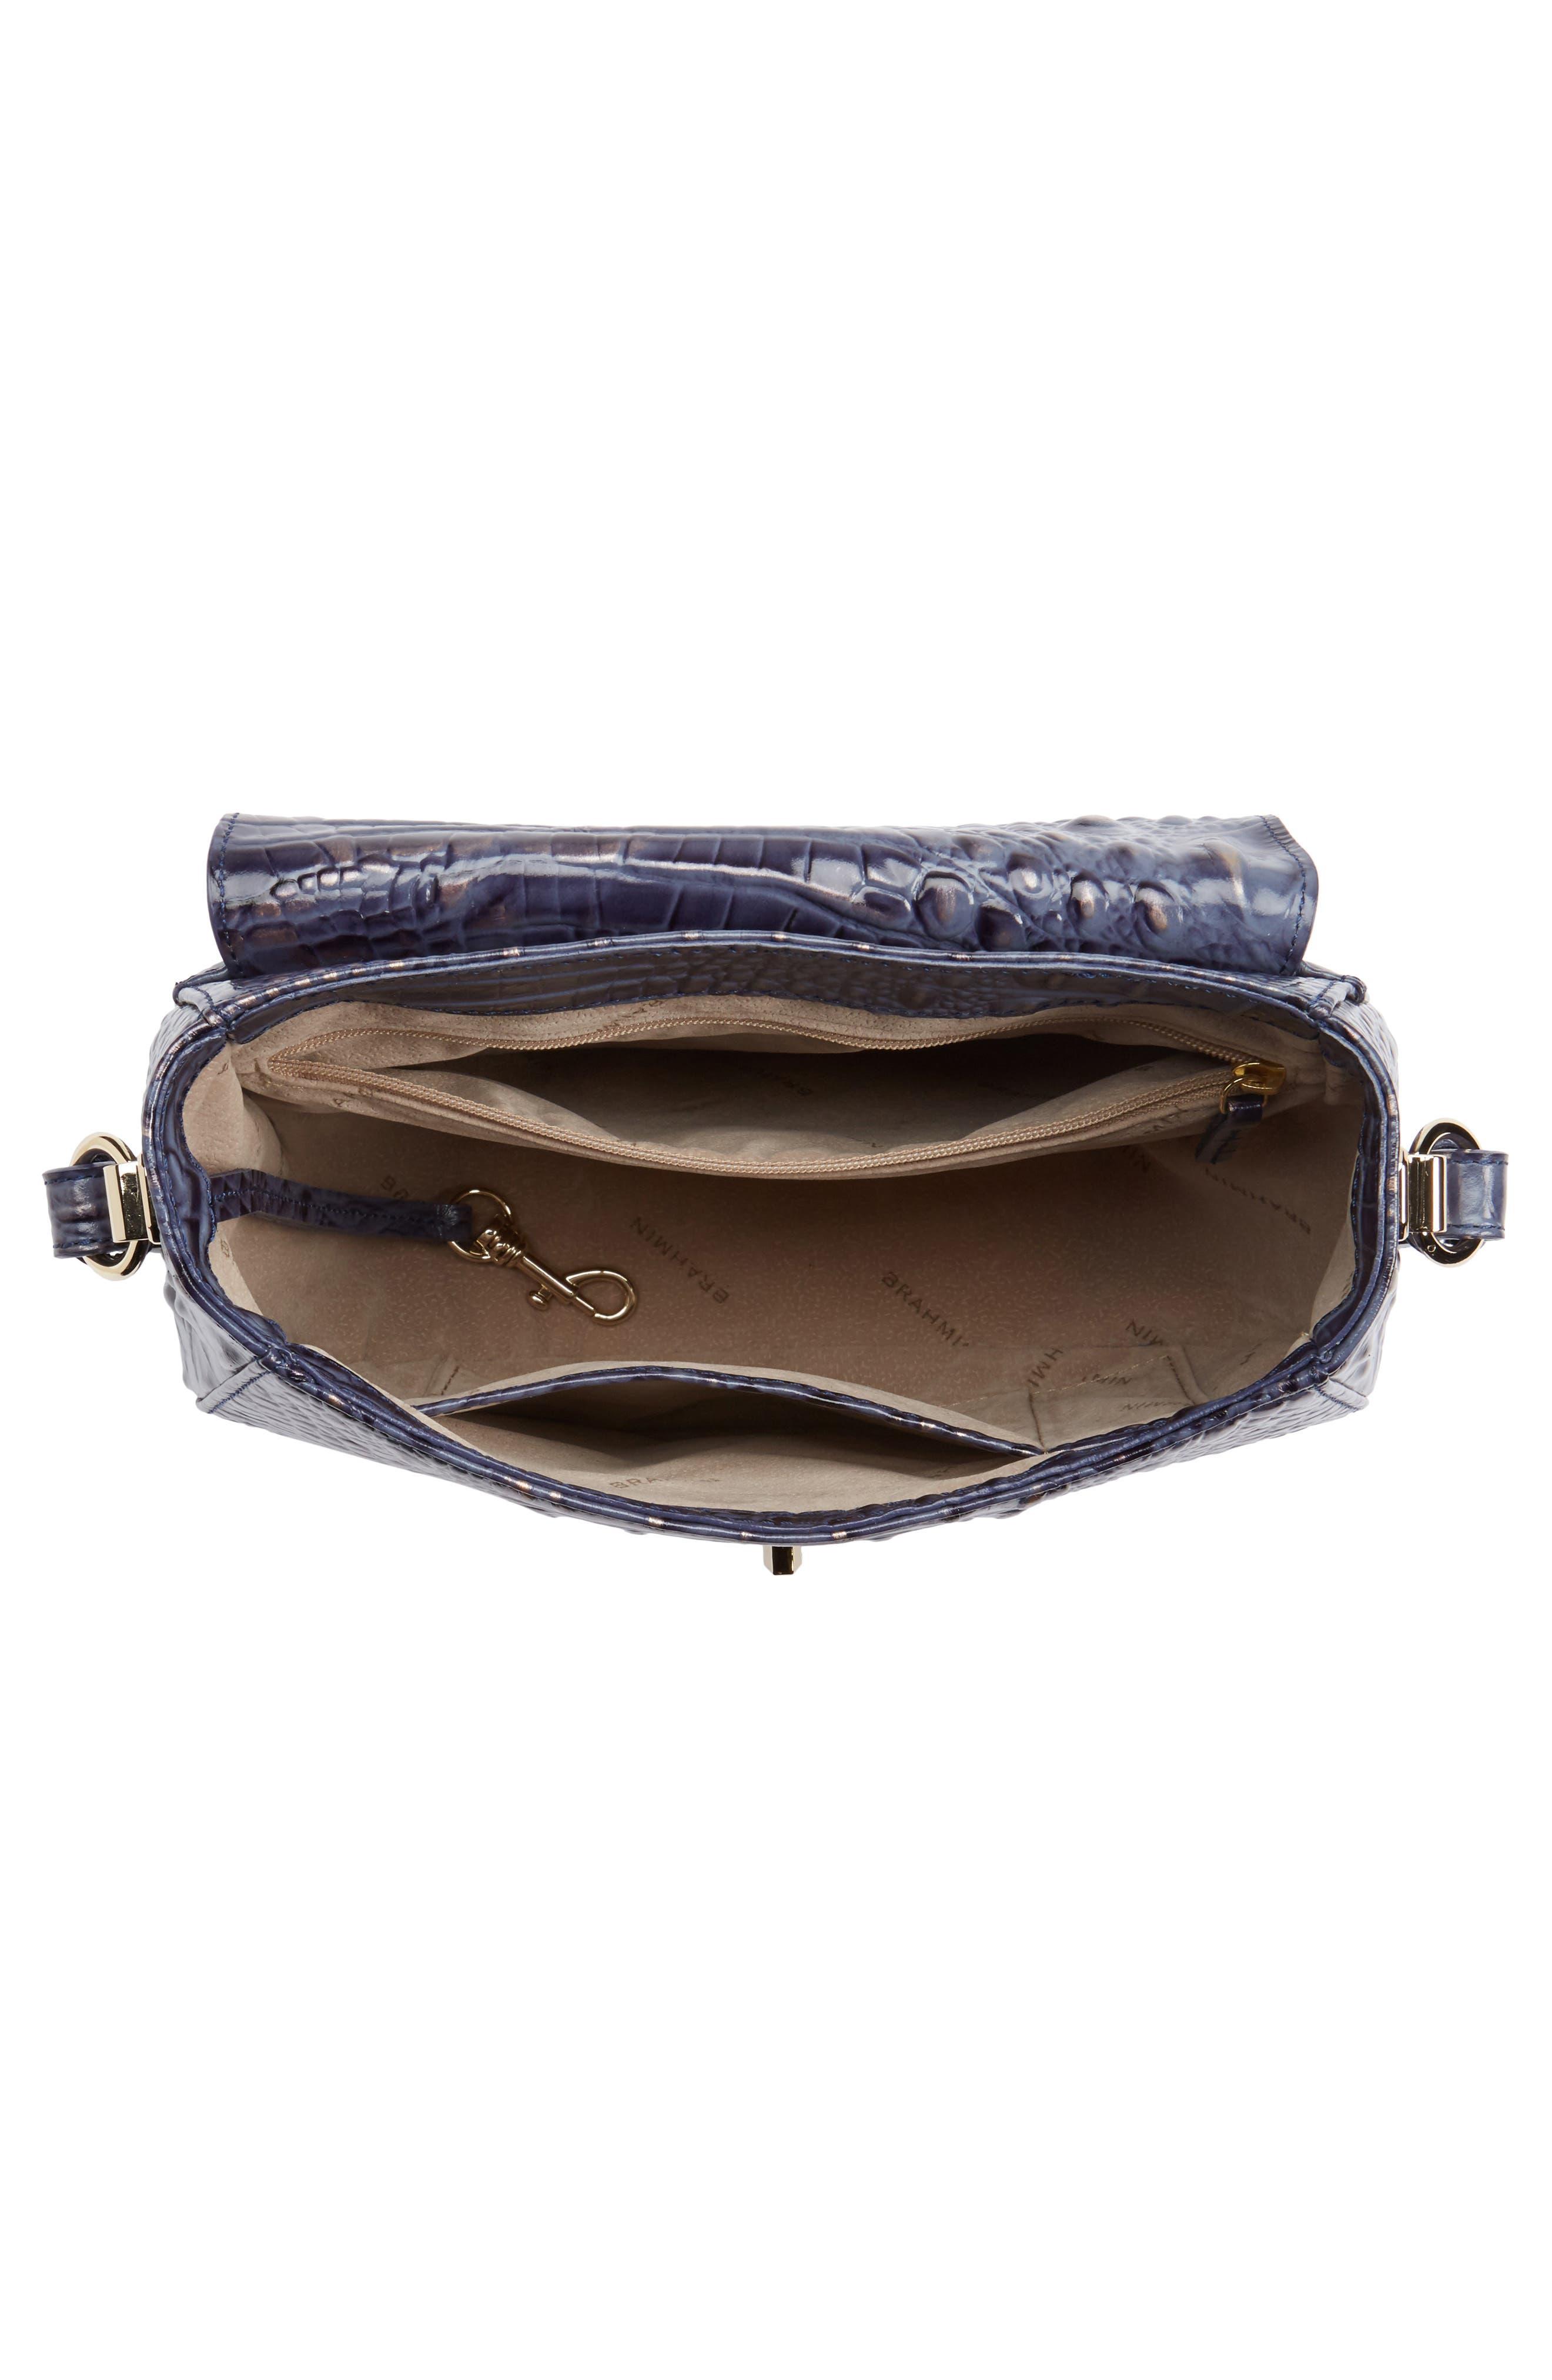 Melbourne - Lizzie Leather Crossbody Bag,                             Alternate thumbnail 19, color,